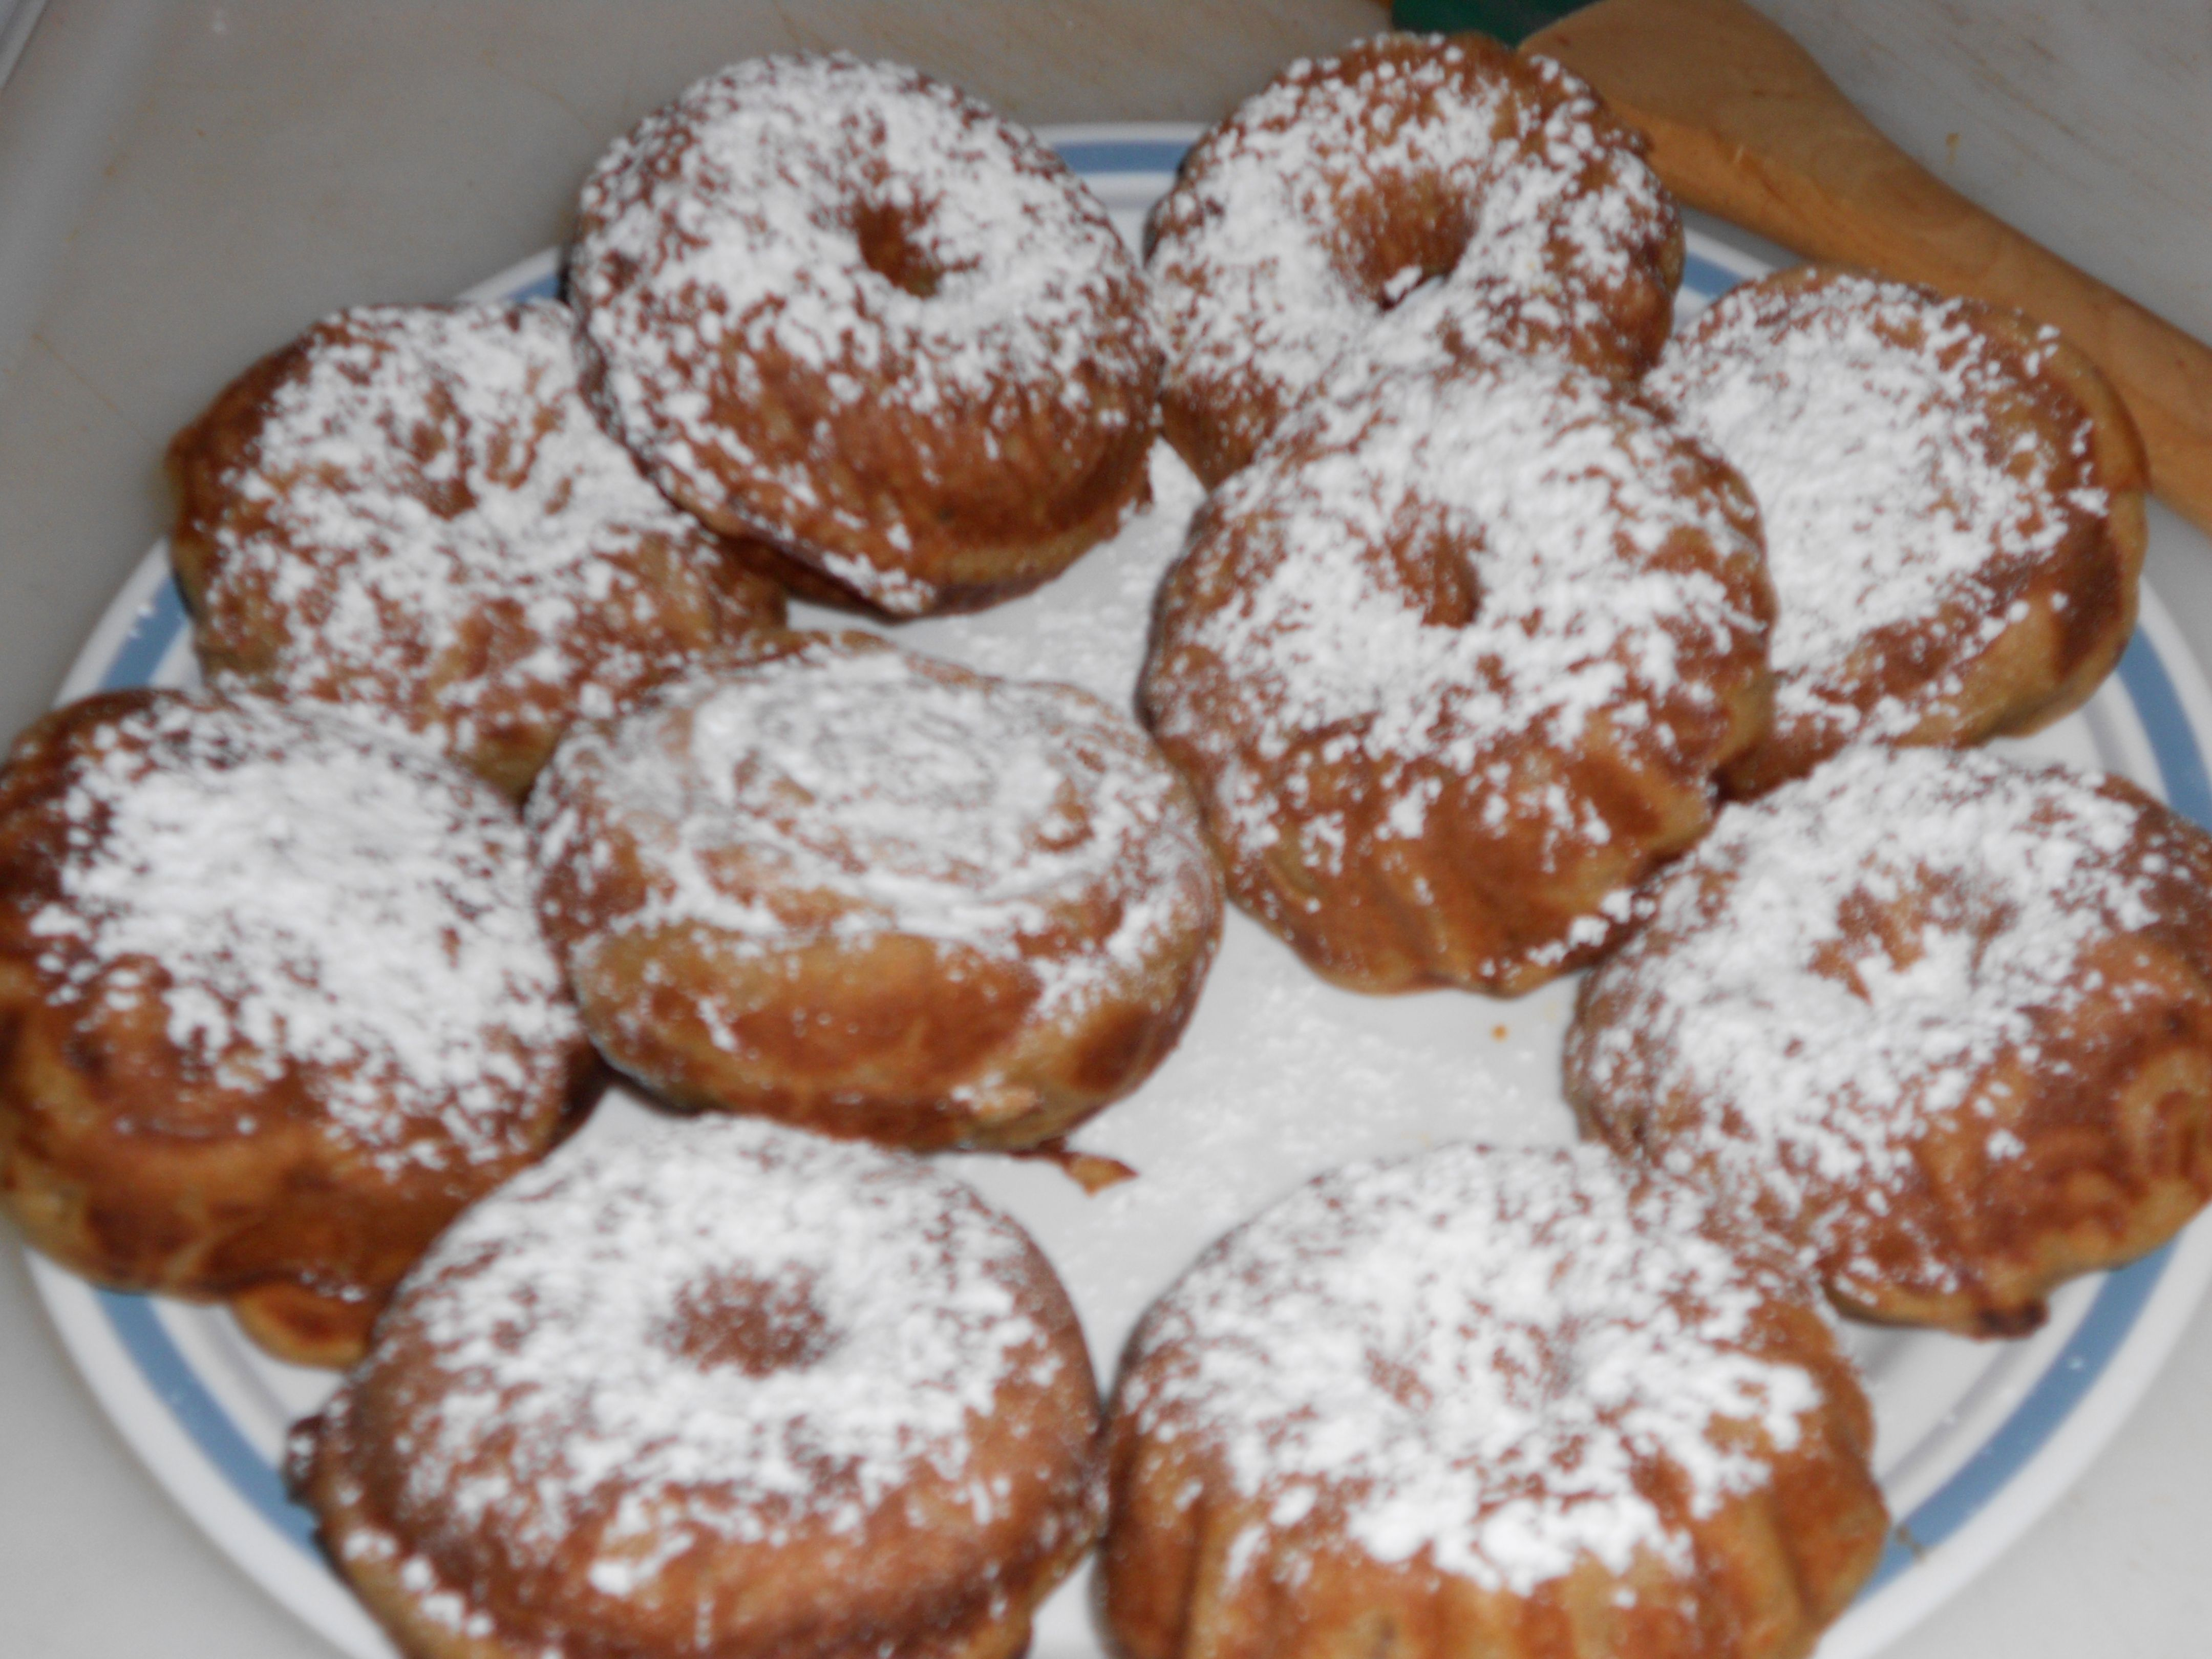 gluten free mini bundt cakes | Gluten free | Pinterest